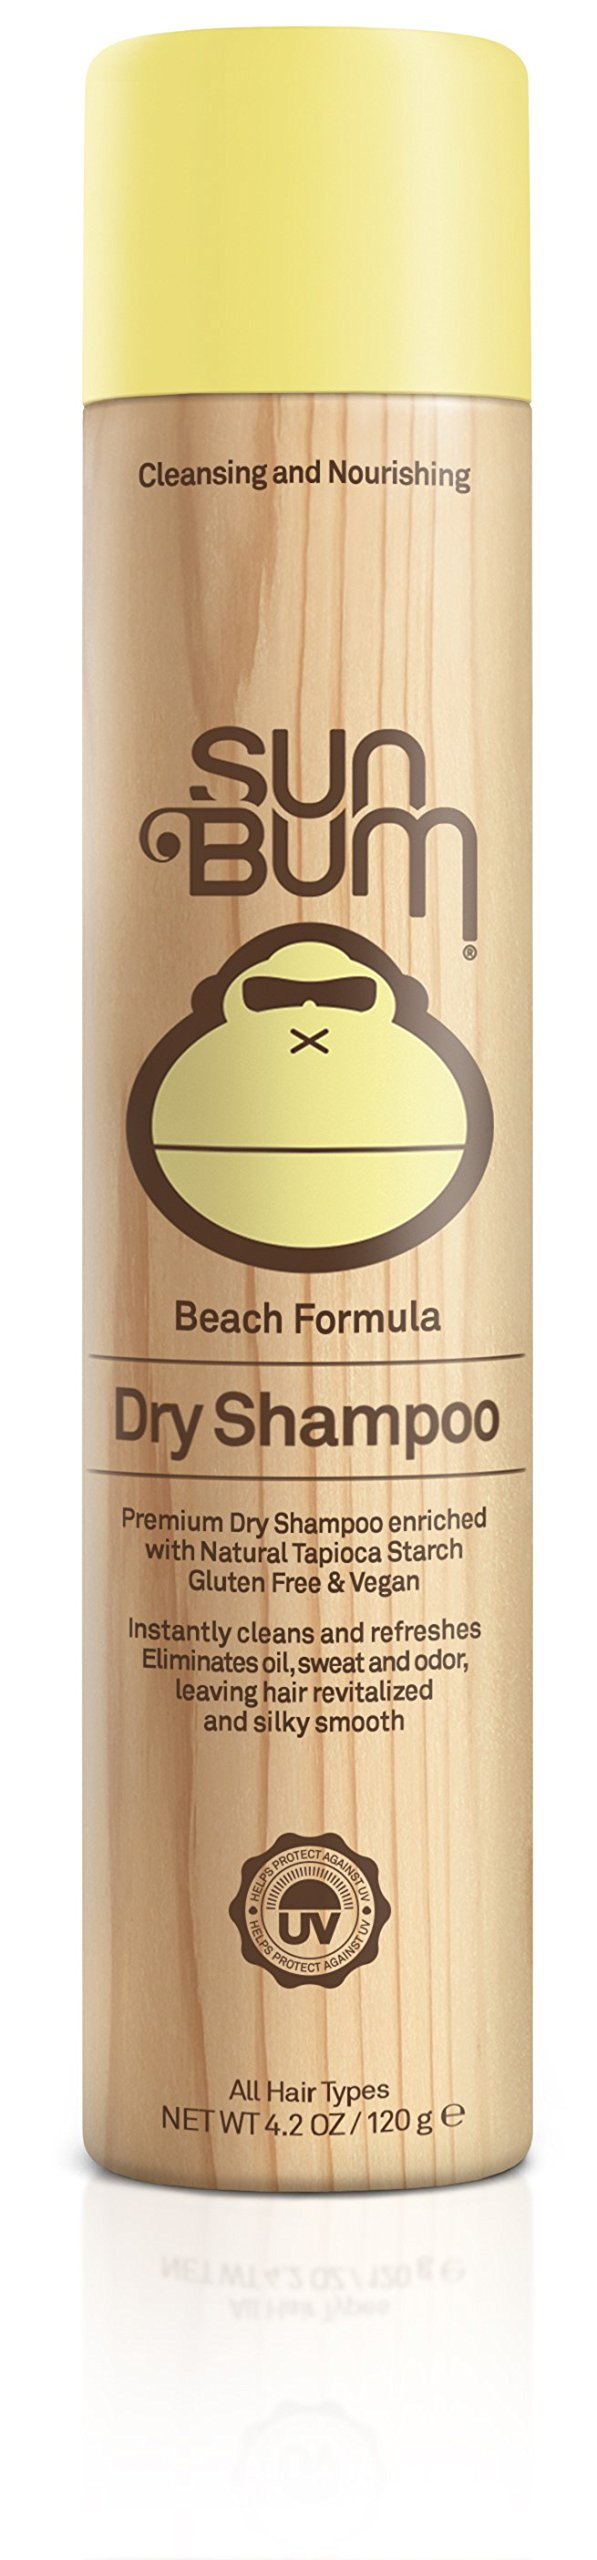 Sun Bum Beach Formula Revitalizing Dry Shampoo, 4.2 oz Bottle, 1 Count, Hair Refresher, Texturing Spray, Paraben Free, Oil Free, Gluten Free, Vegan